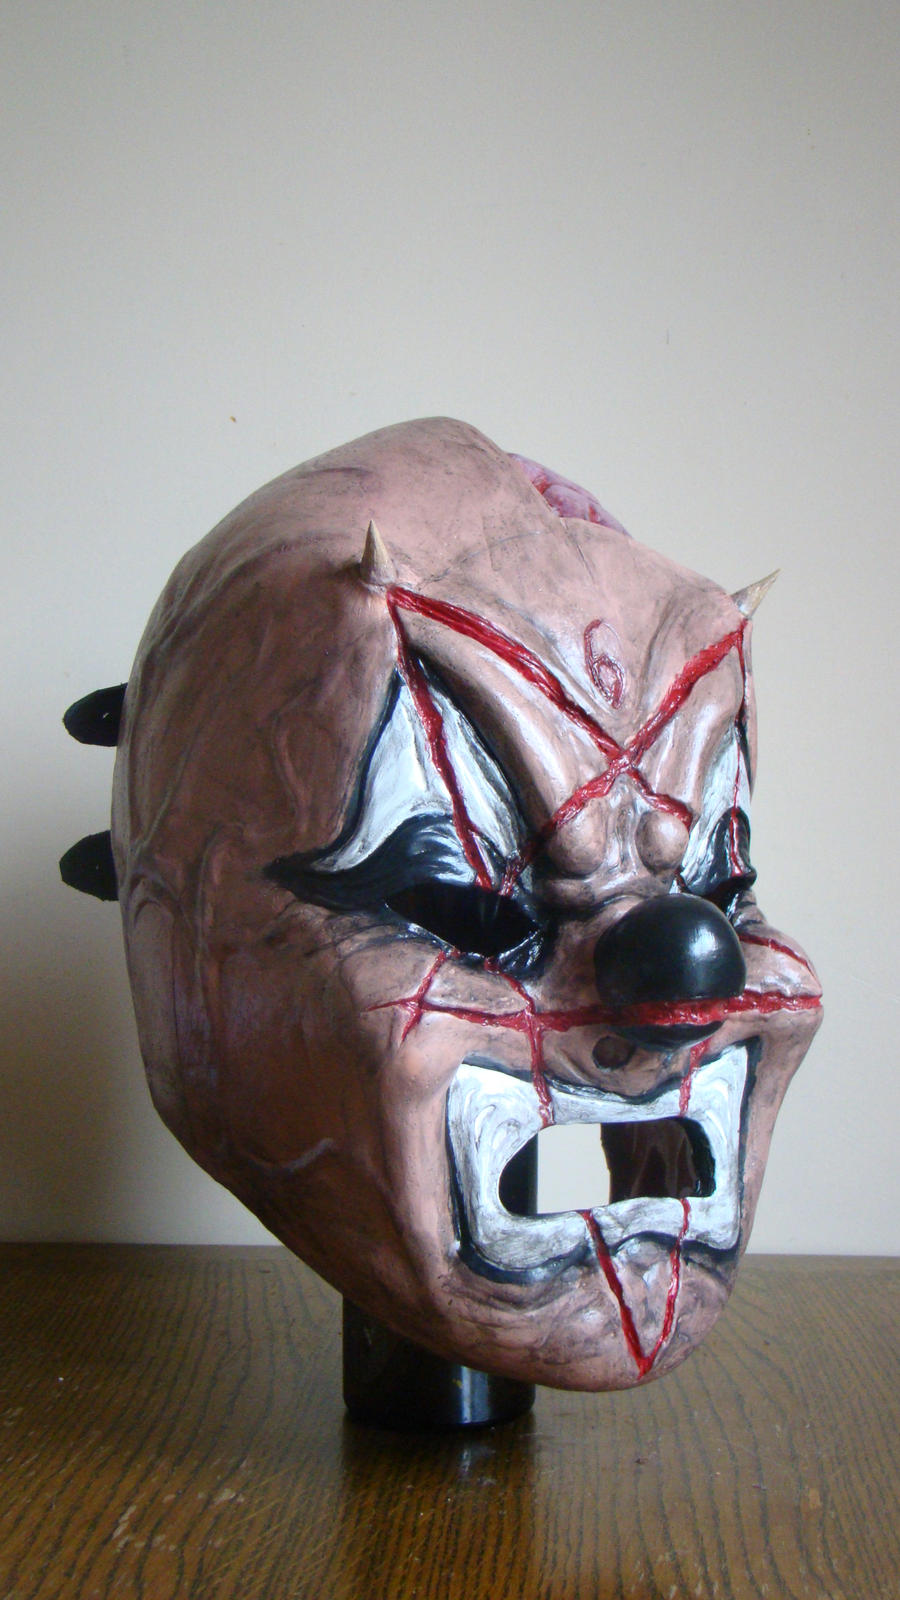 Clown Slipknot New Mask Tour